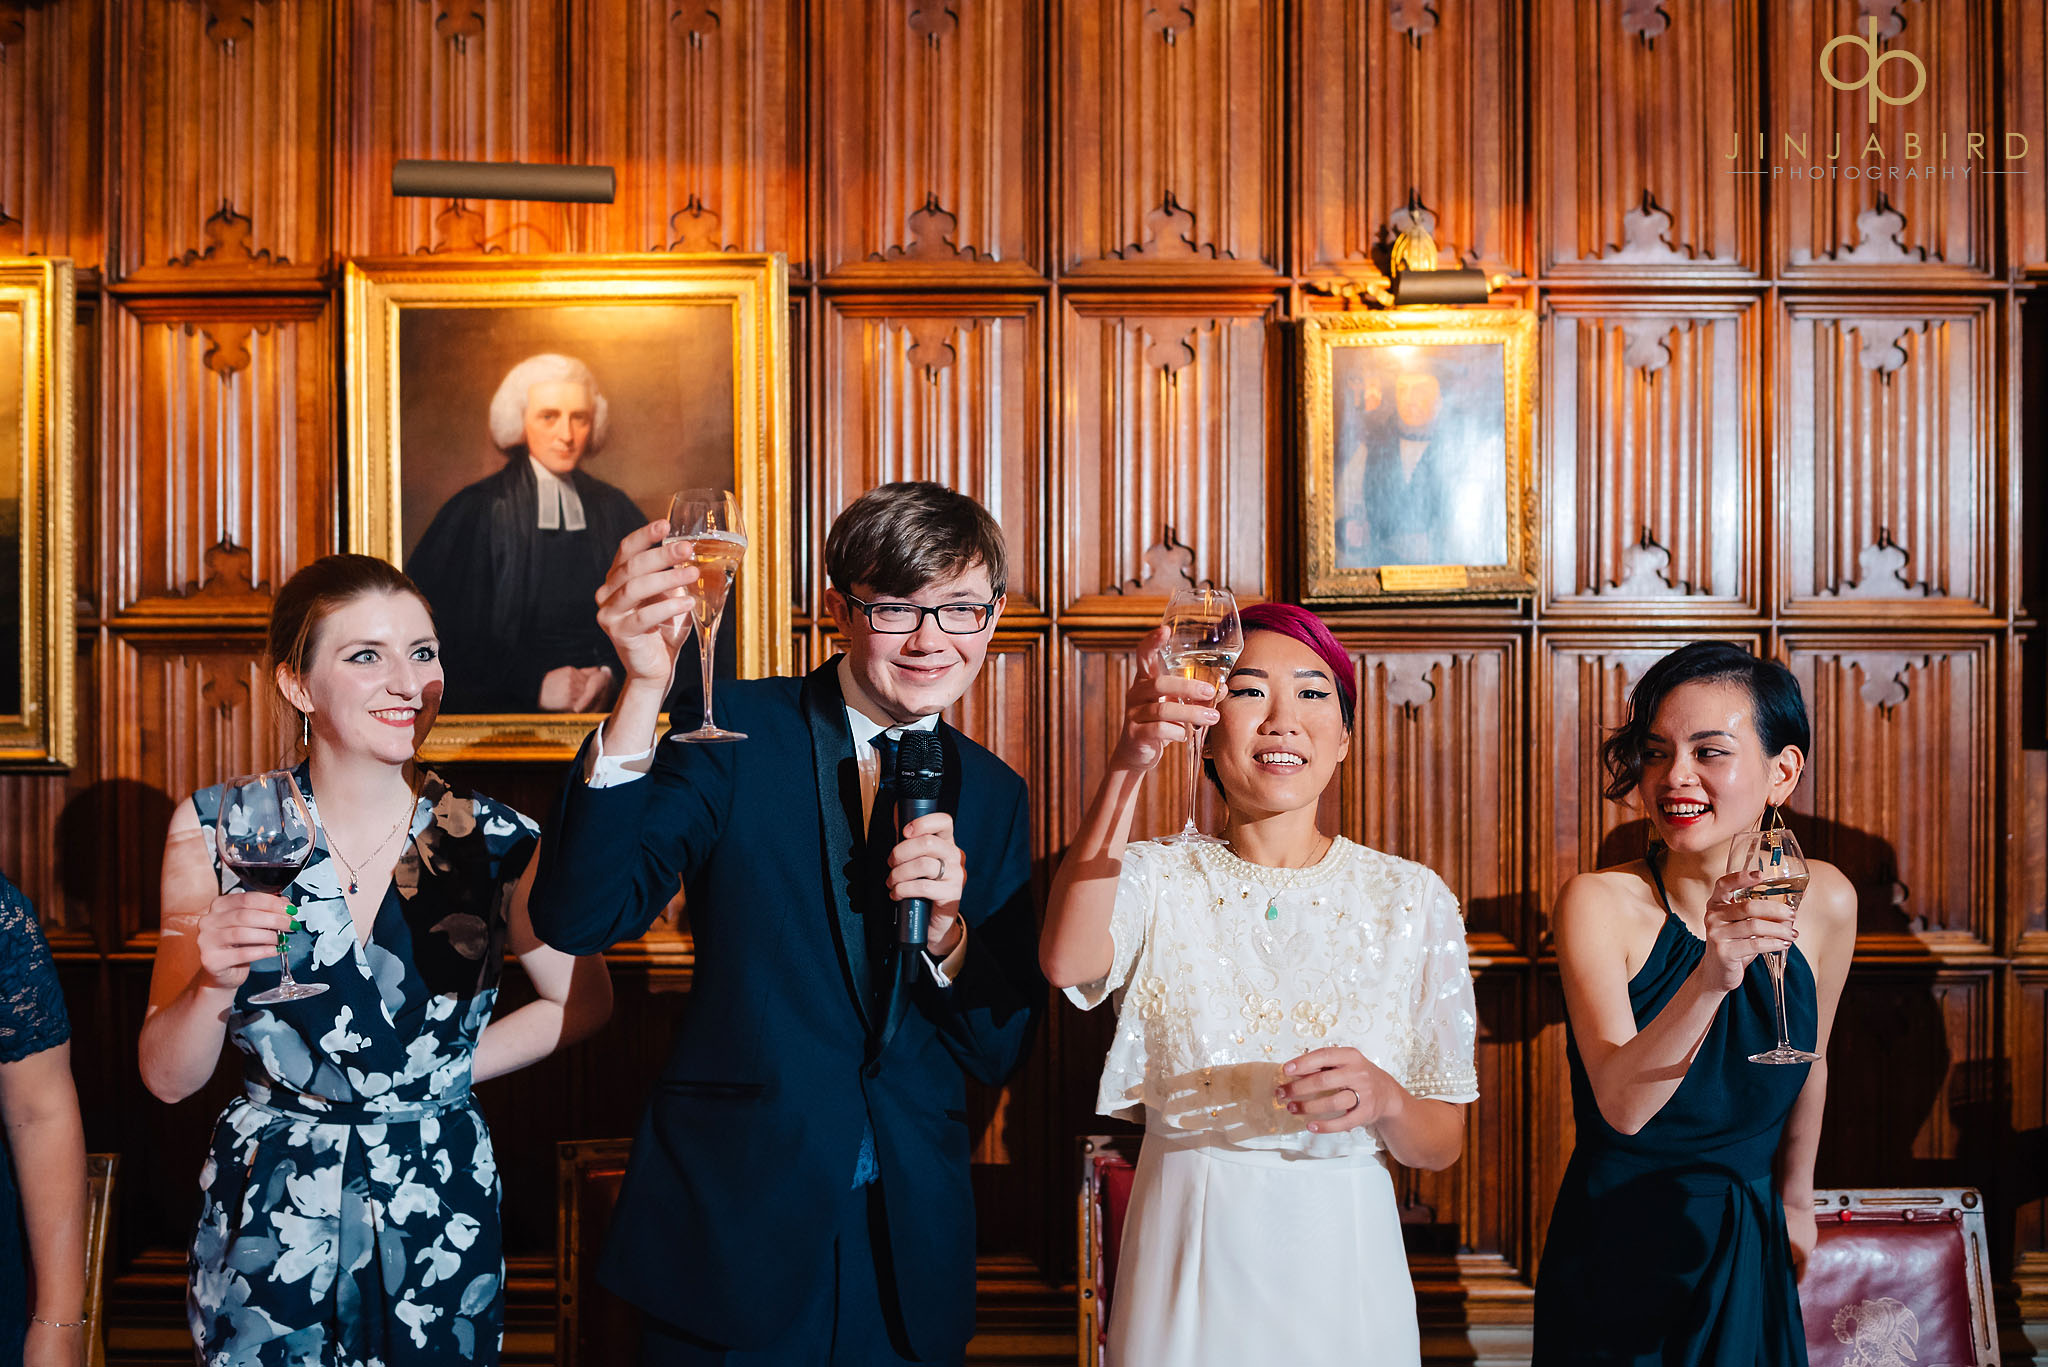 wedding-toast-corpus-christi-college